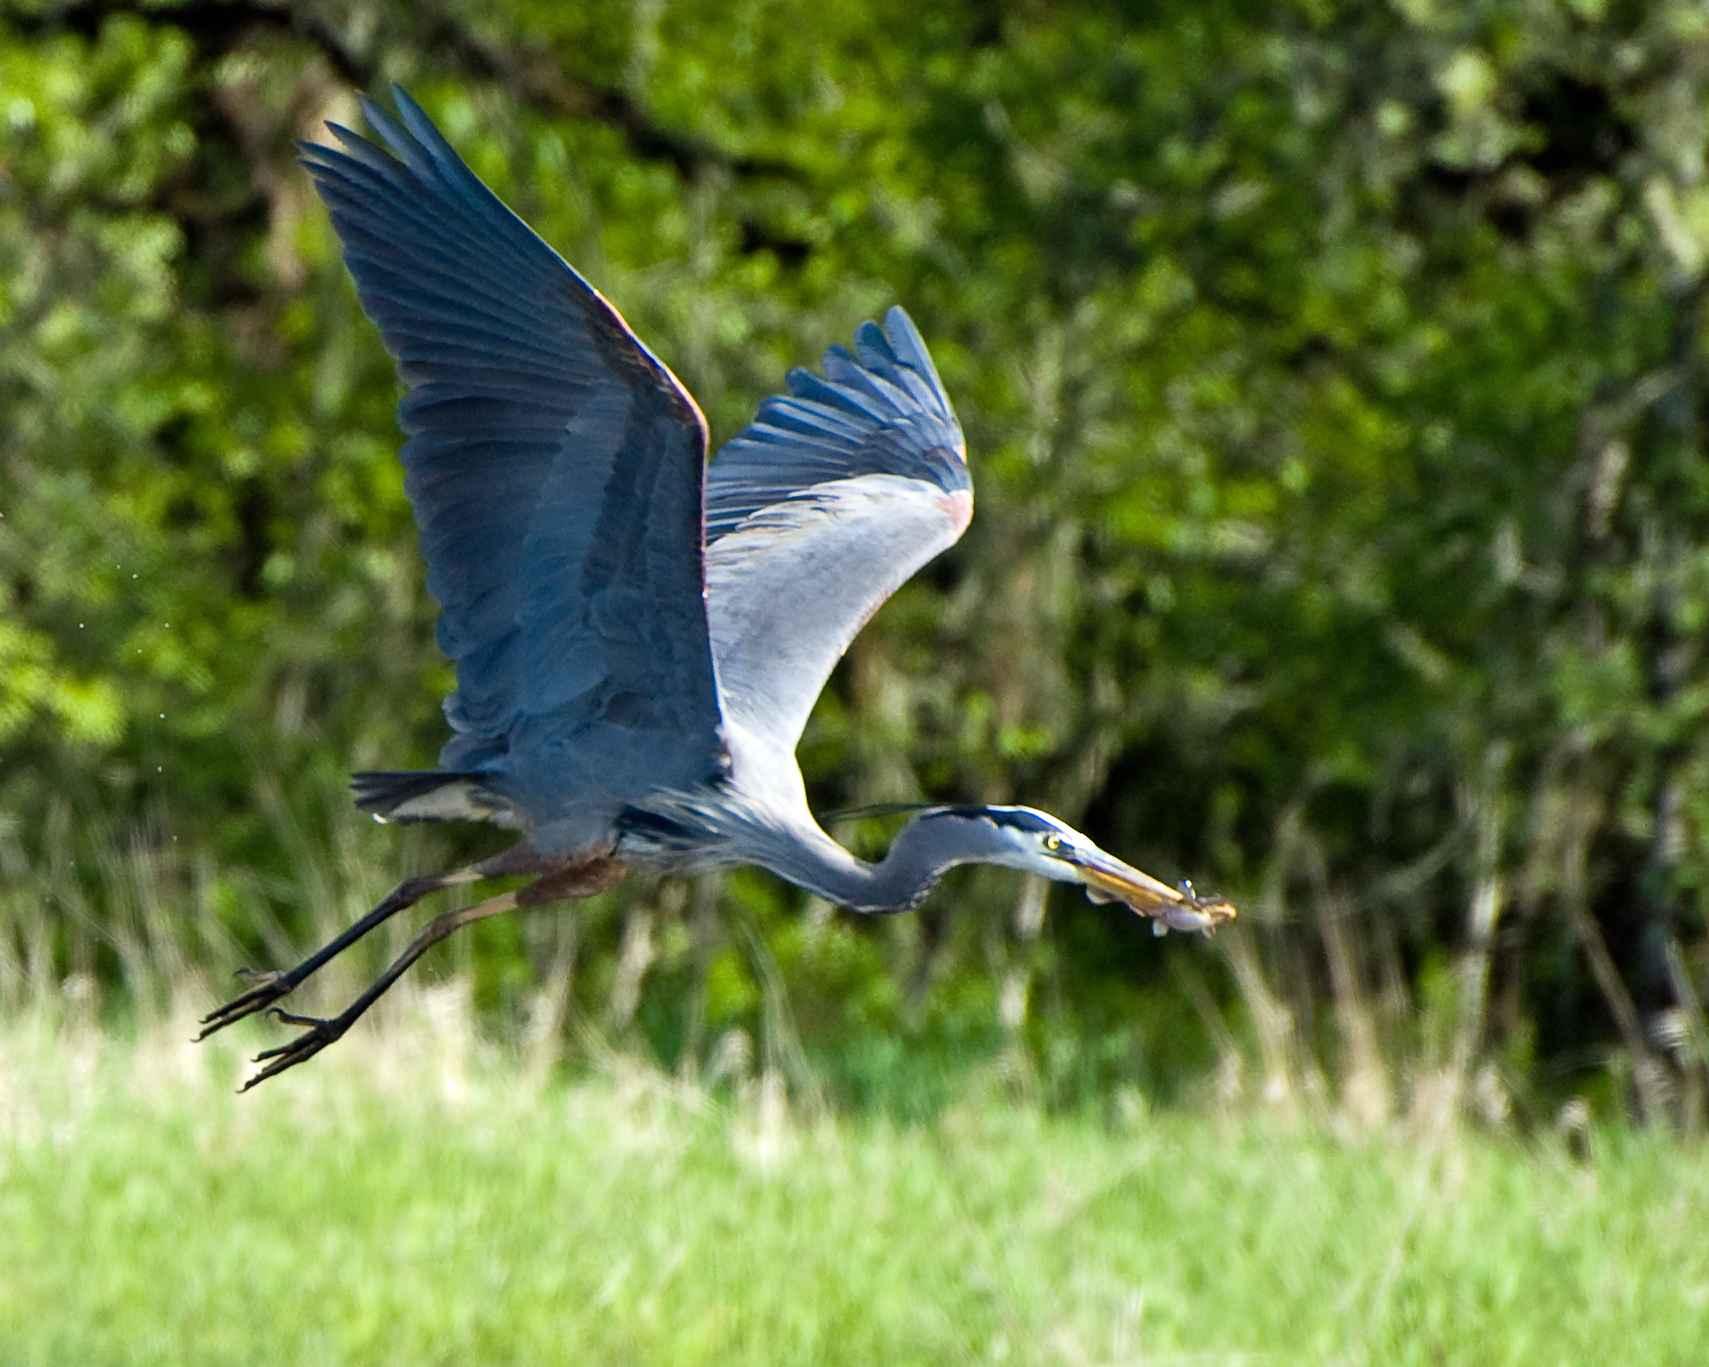 Free picture: great, blue, heron, bird, ardea herodias, flies, catch